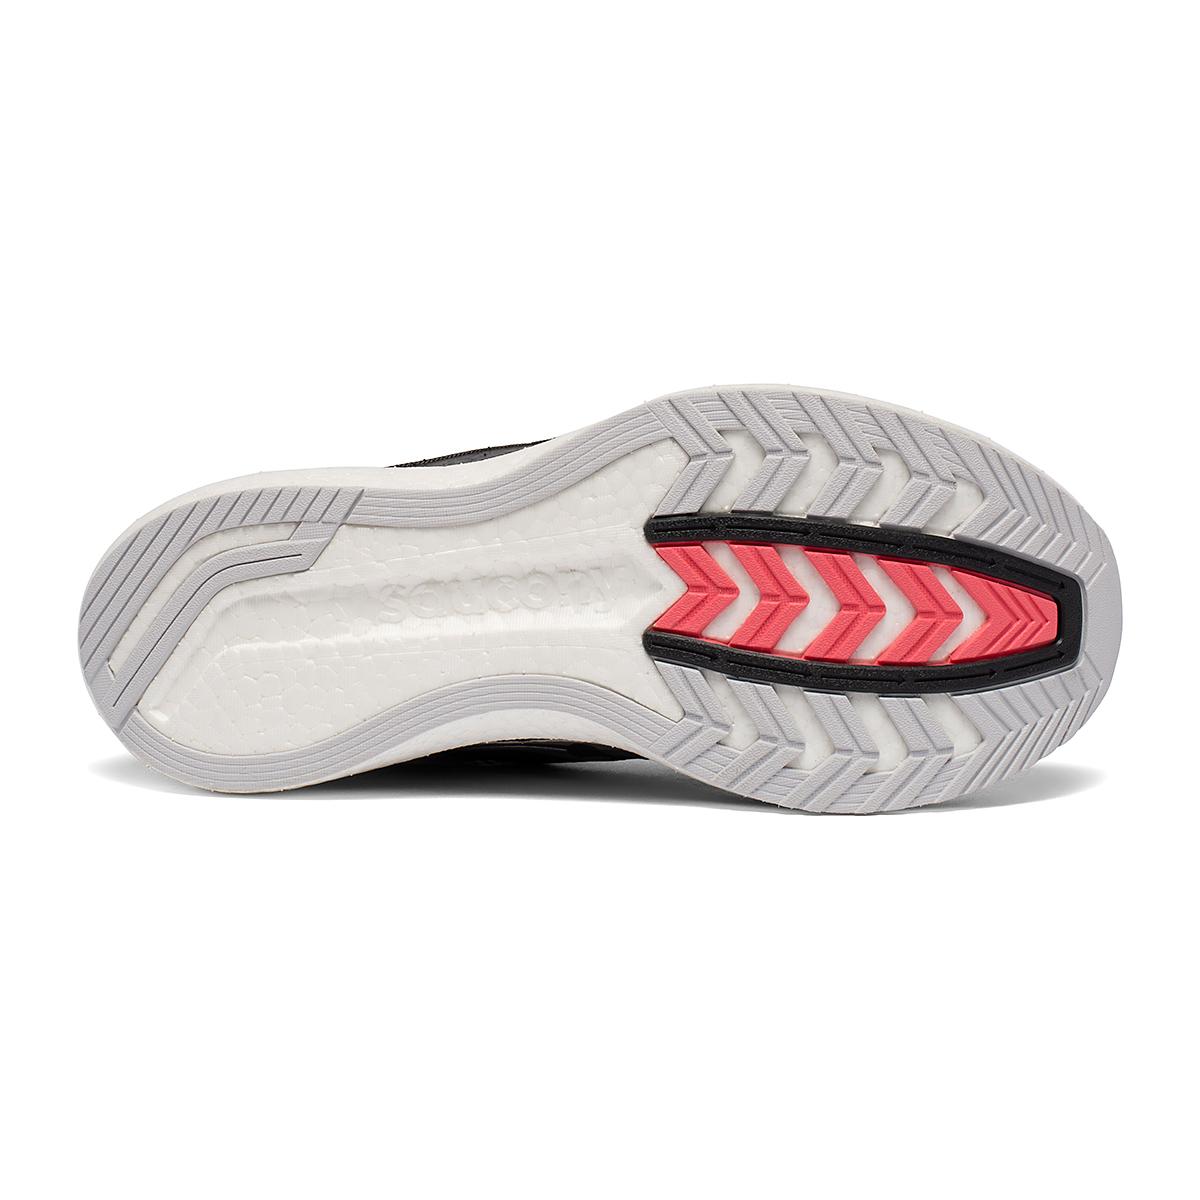 Women's Saucony Endorphin Pro Running Shoe - Color: Black/Silver - Size: 5 - Width: Regular, Black/Silver, large, image 5